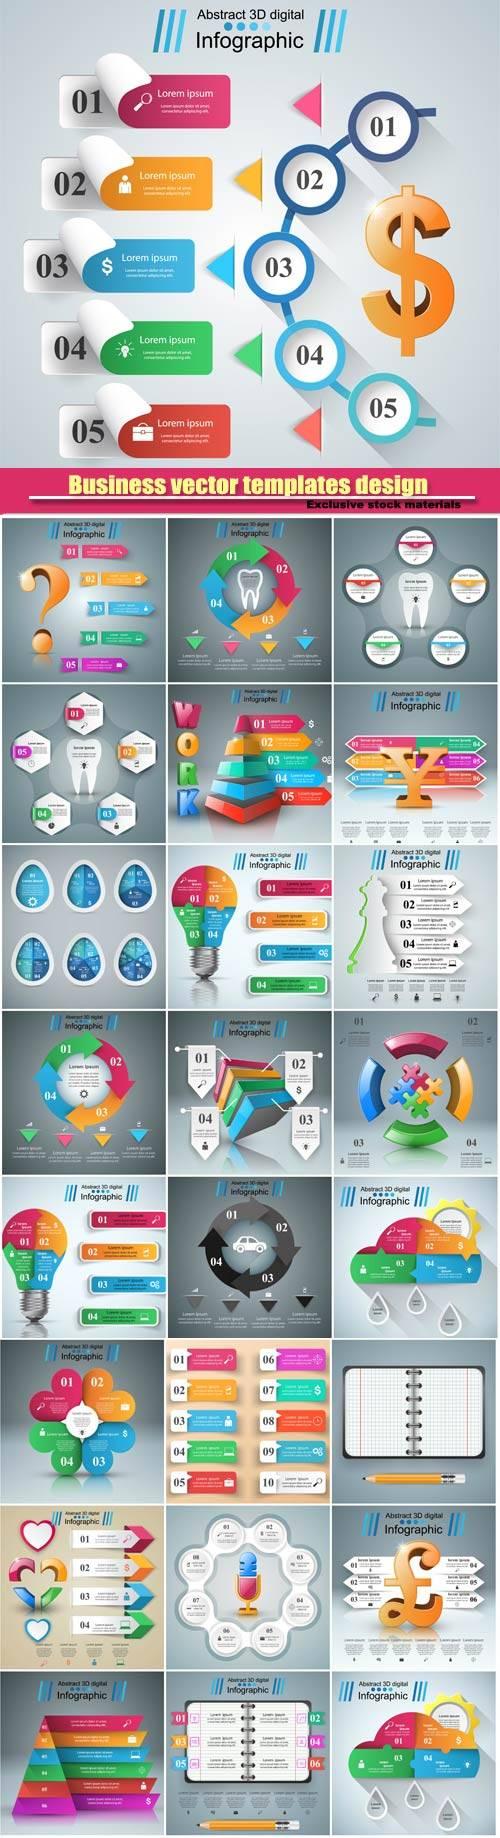 3D business infographic vector design